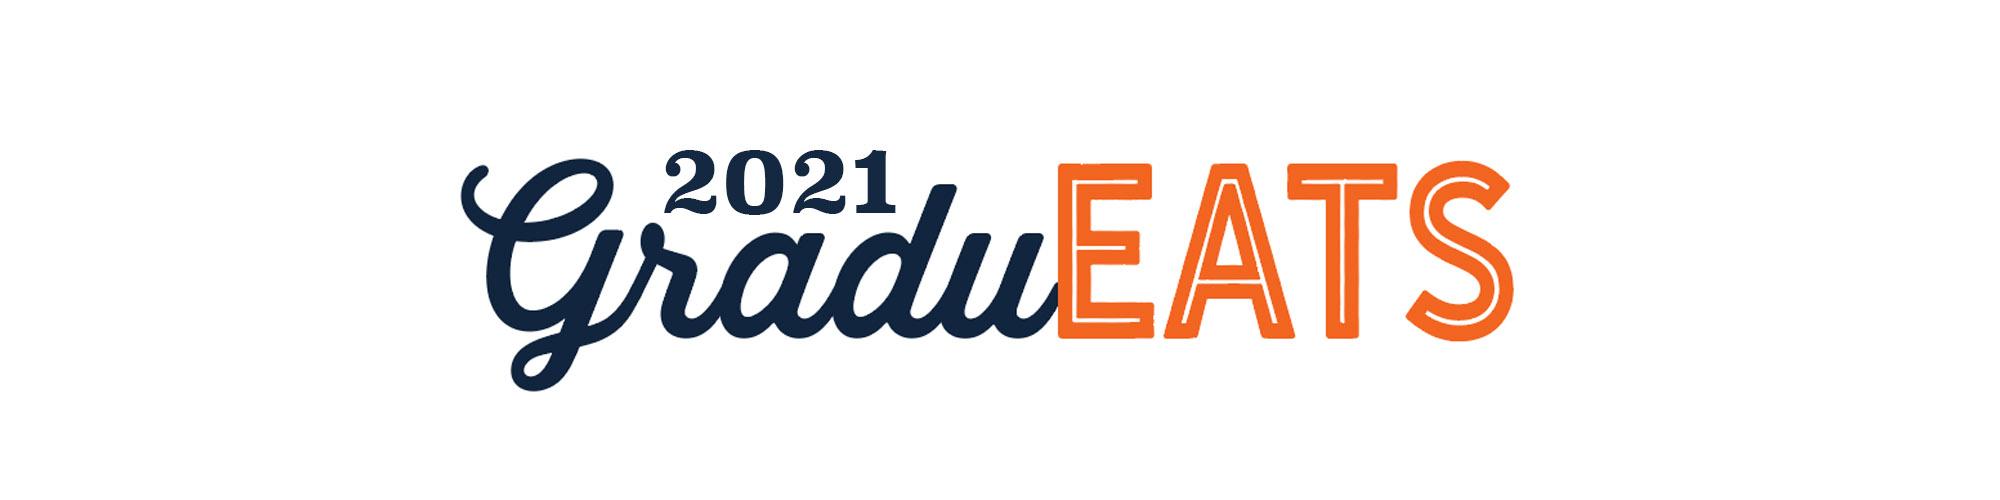 2021_Gradueats_webheader